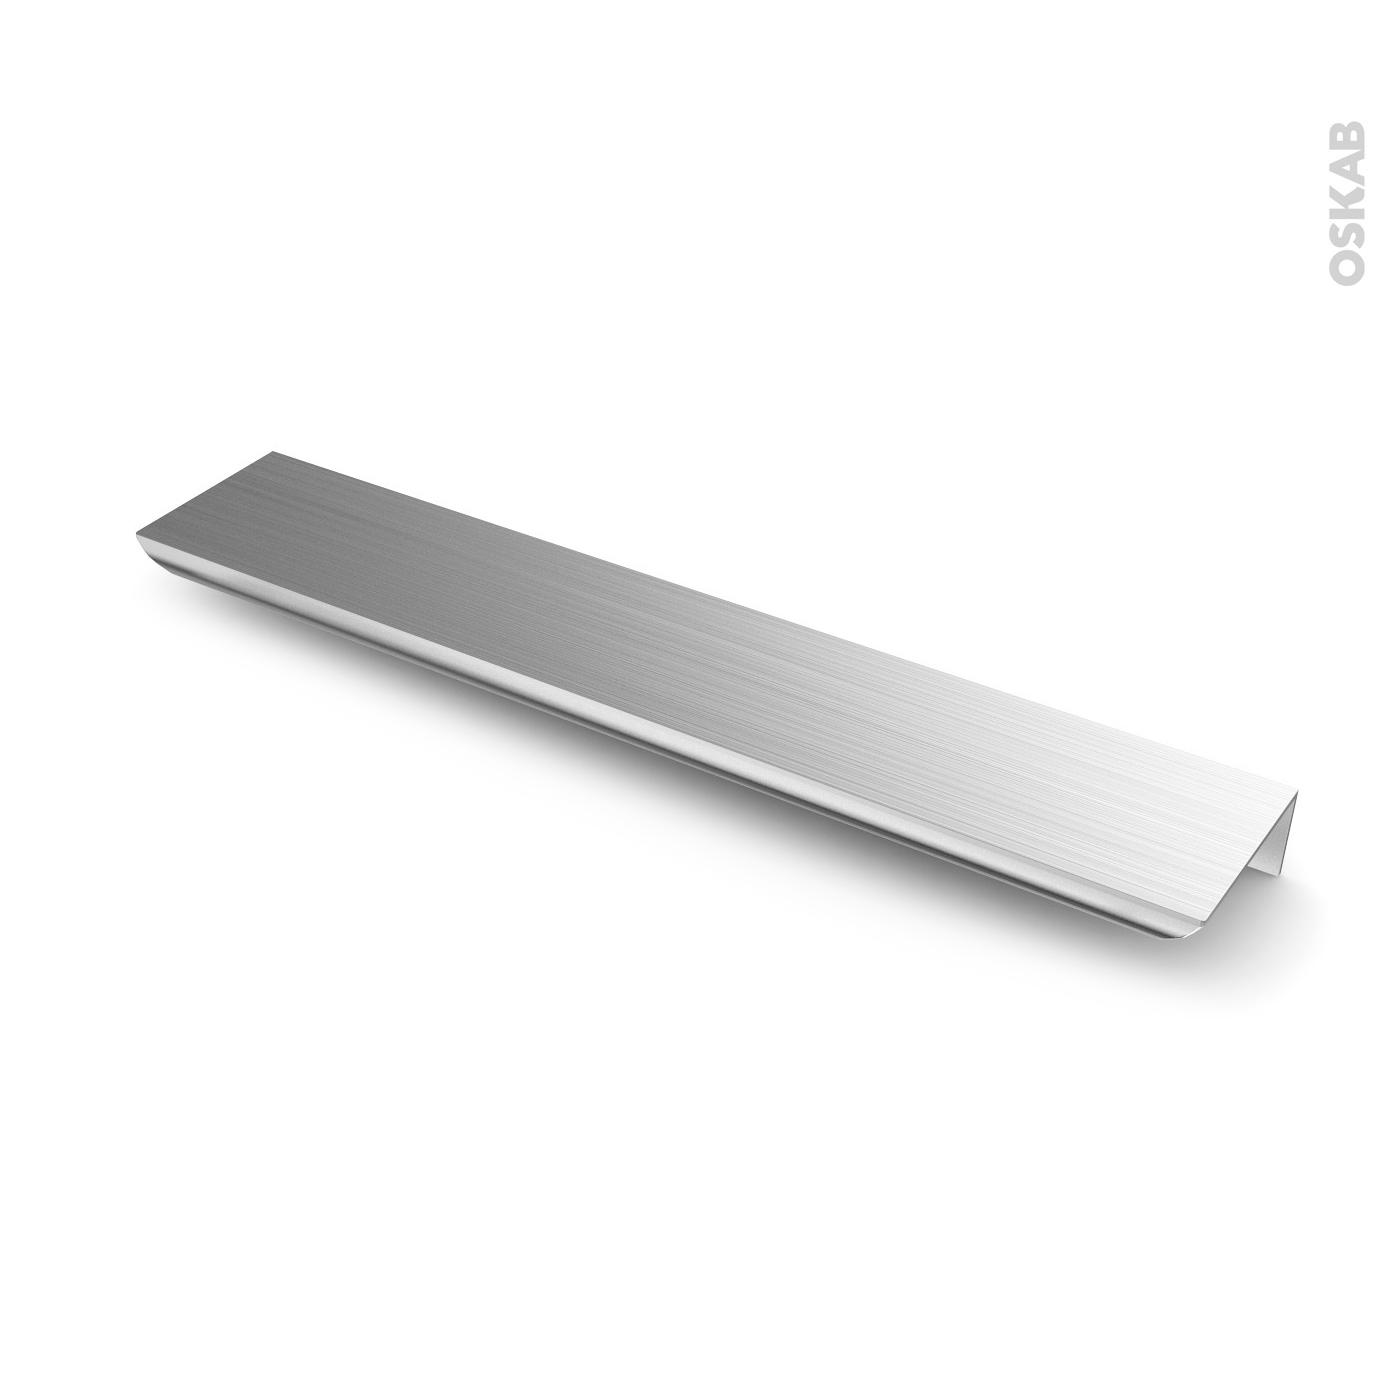 Poignée de meuble de cuisine N°12 Inox brossé, 12 cm, Entraxe 12 mm, SOKLEO